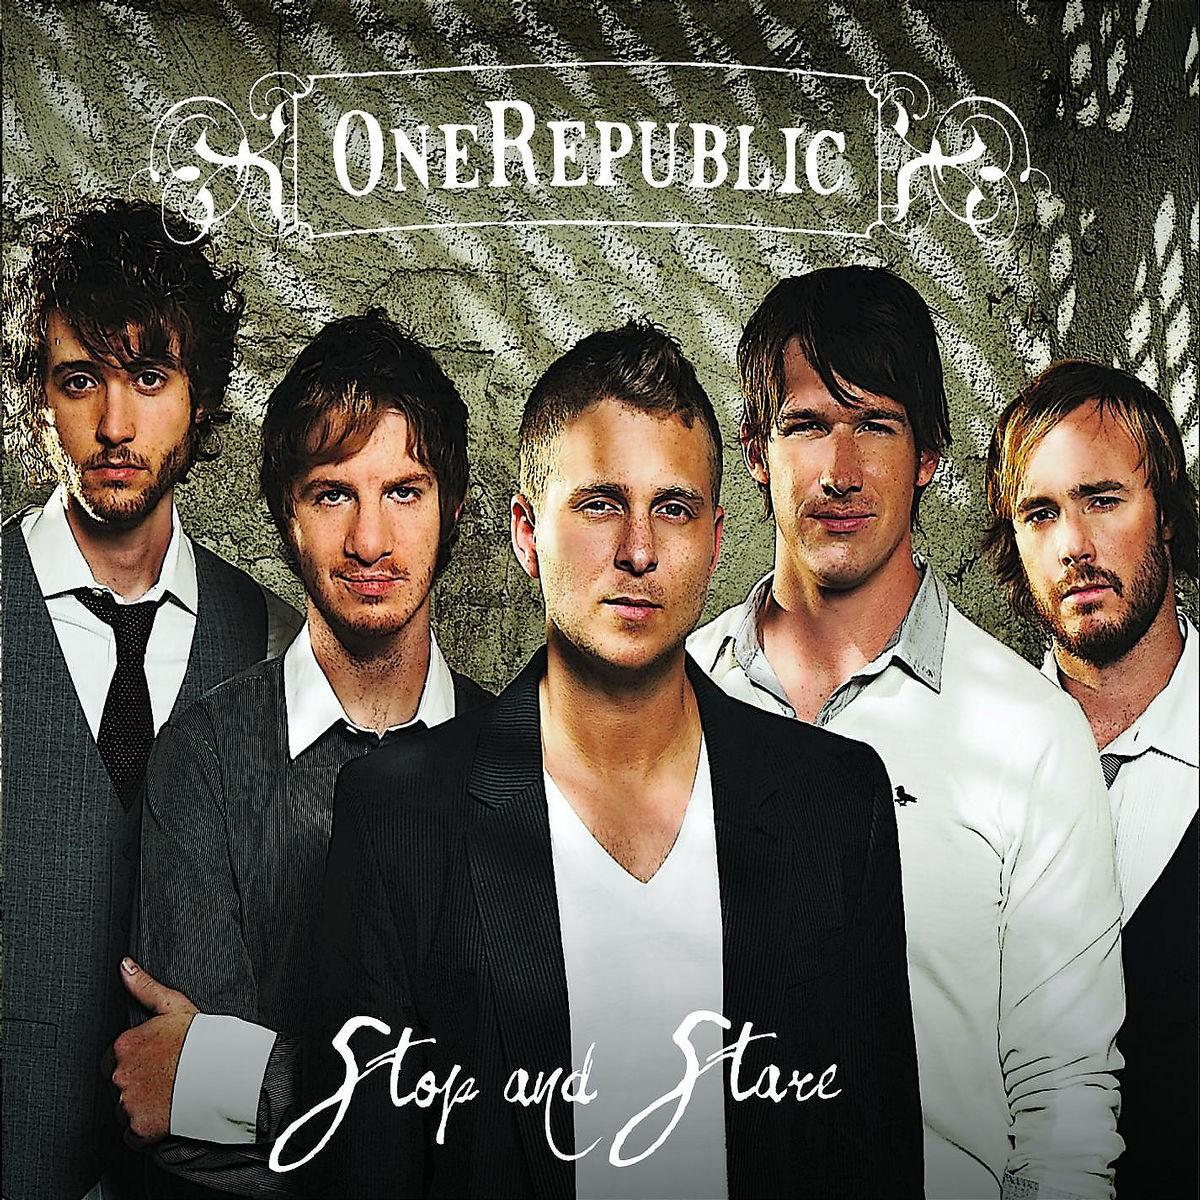 http://bestclub.com.ua/images/Gallery/O/one_republic/disc/2008_one_republic_StopAndStareSINGLE.jpg